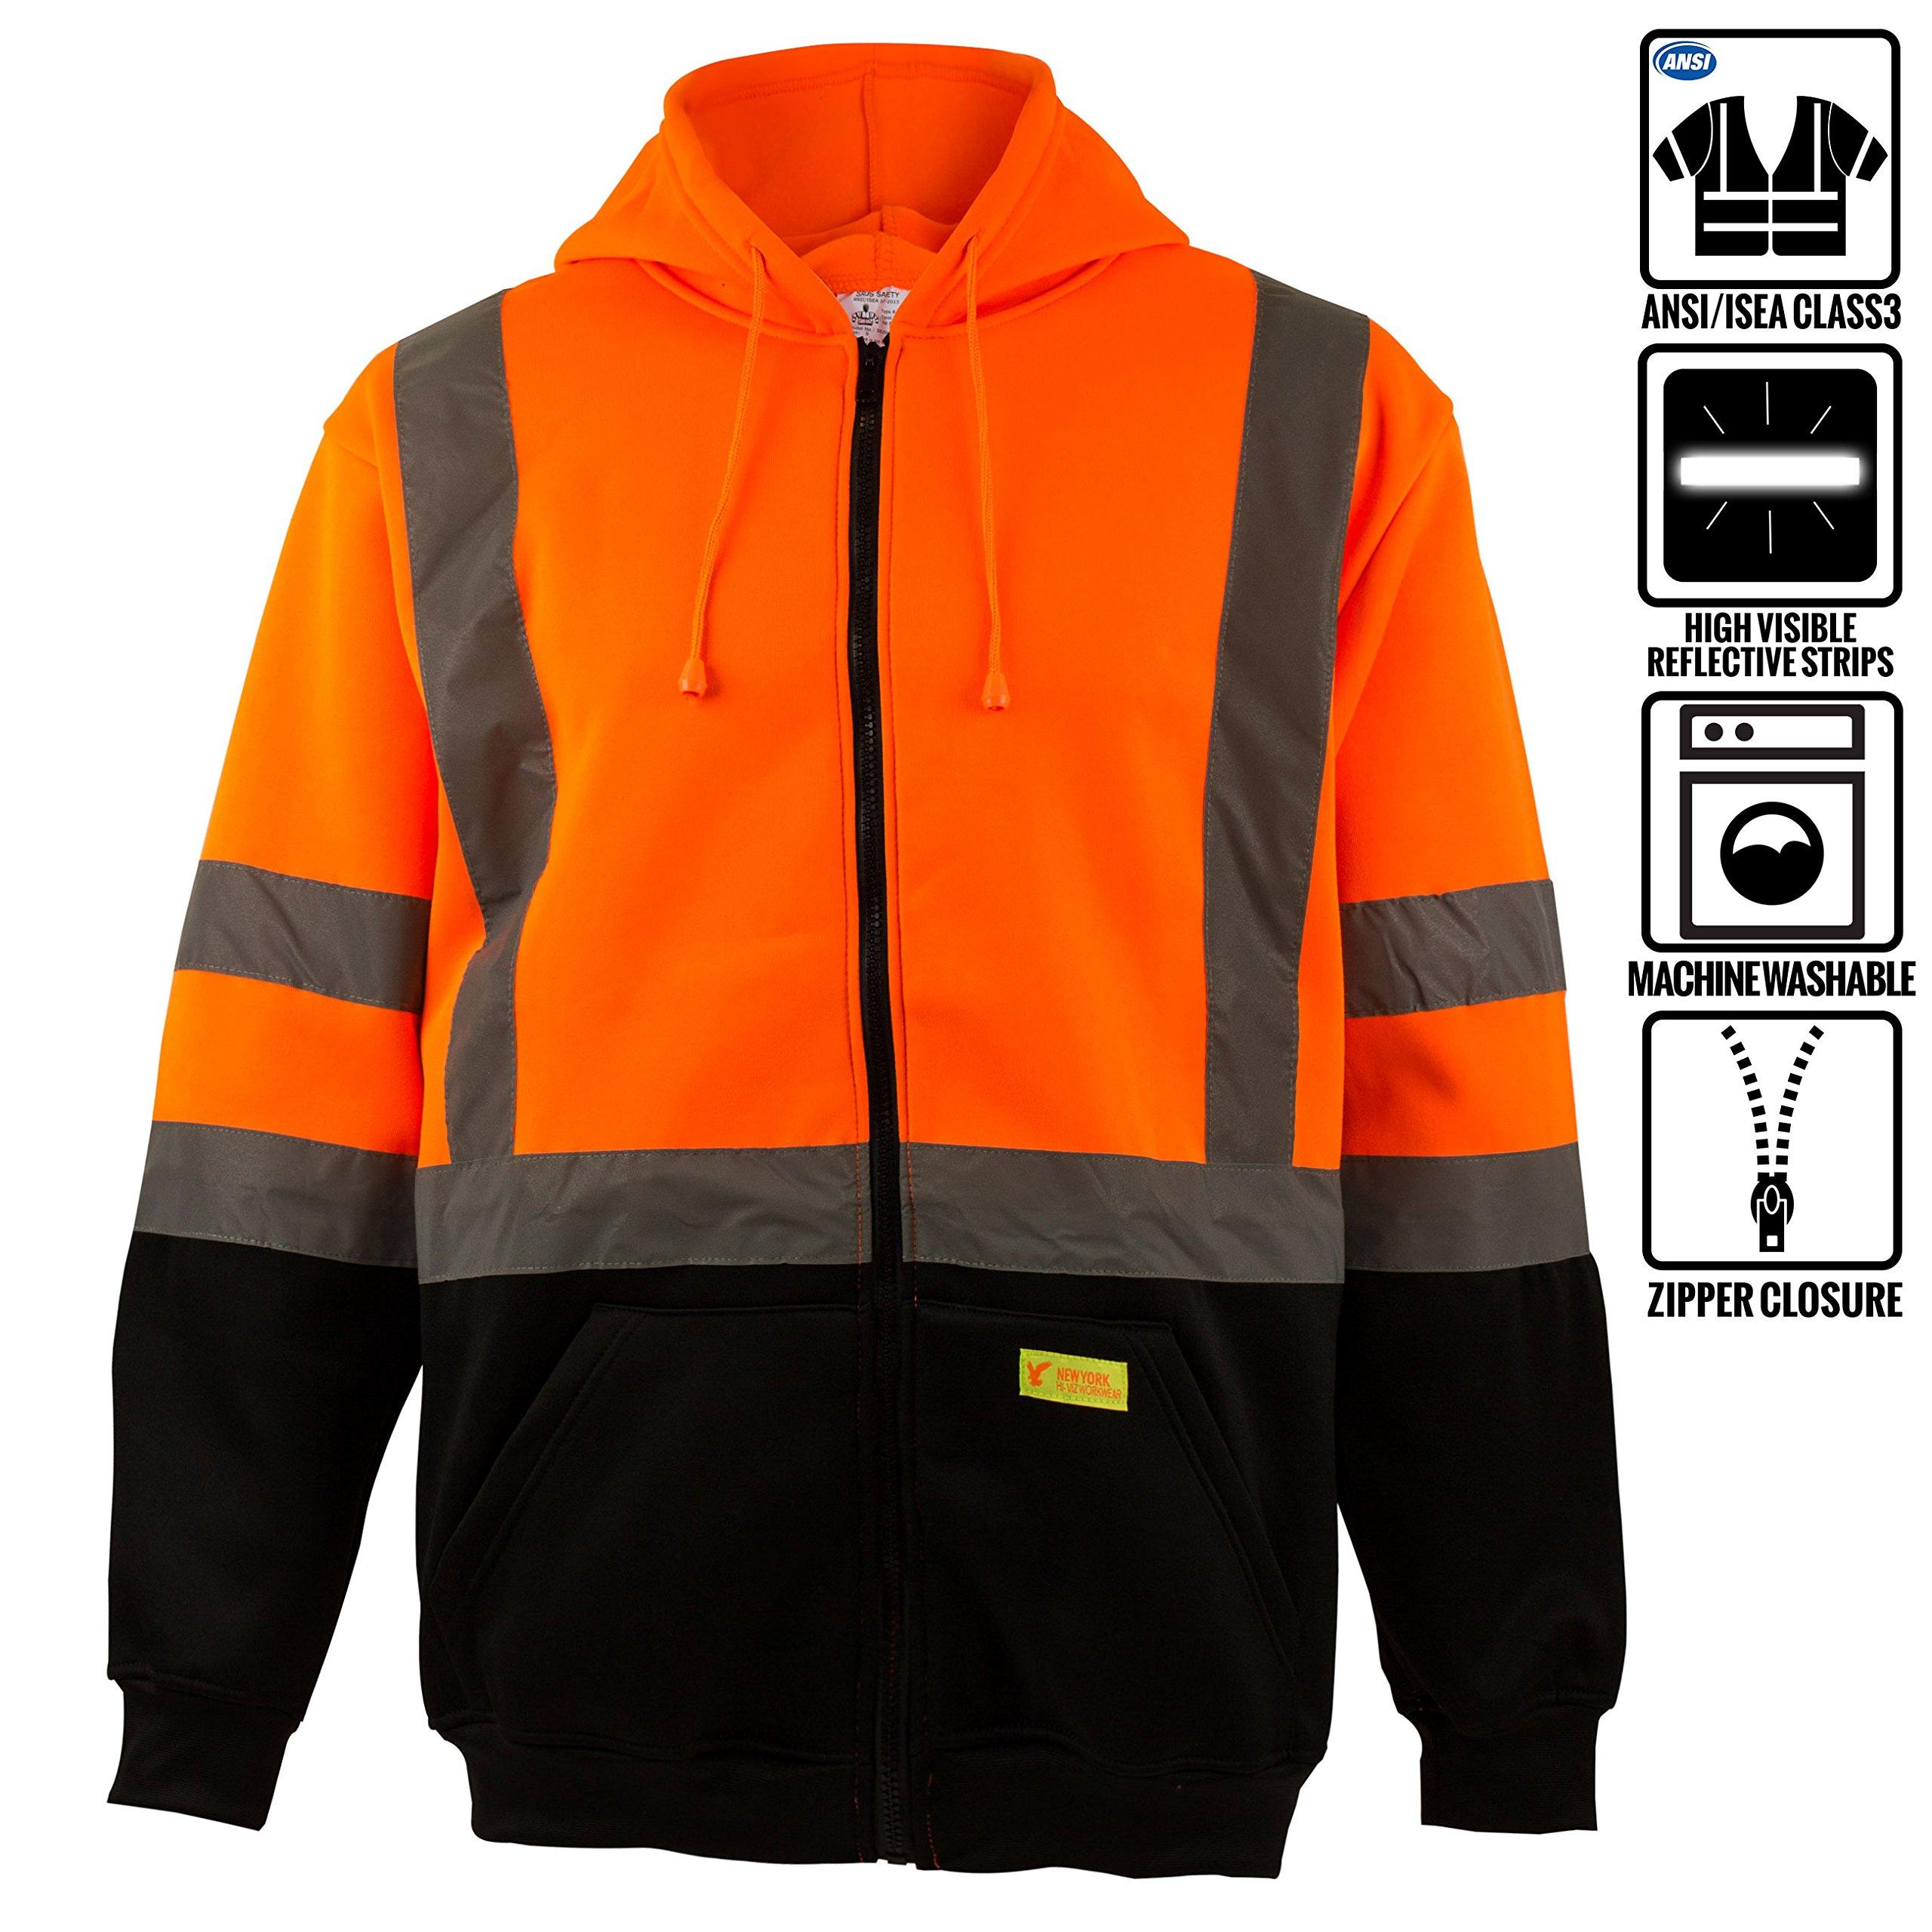 New York Hi-Viz Workwear H9011 Men's ANSI Class 3 High Visibility Class 3 Sweatshirt, Full Zip Hooded, Lightweight, Black Bottom (Large)